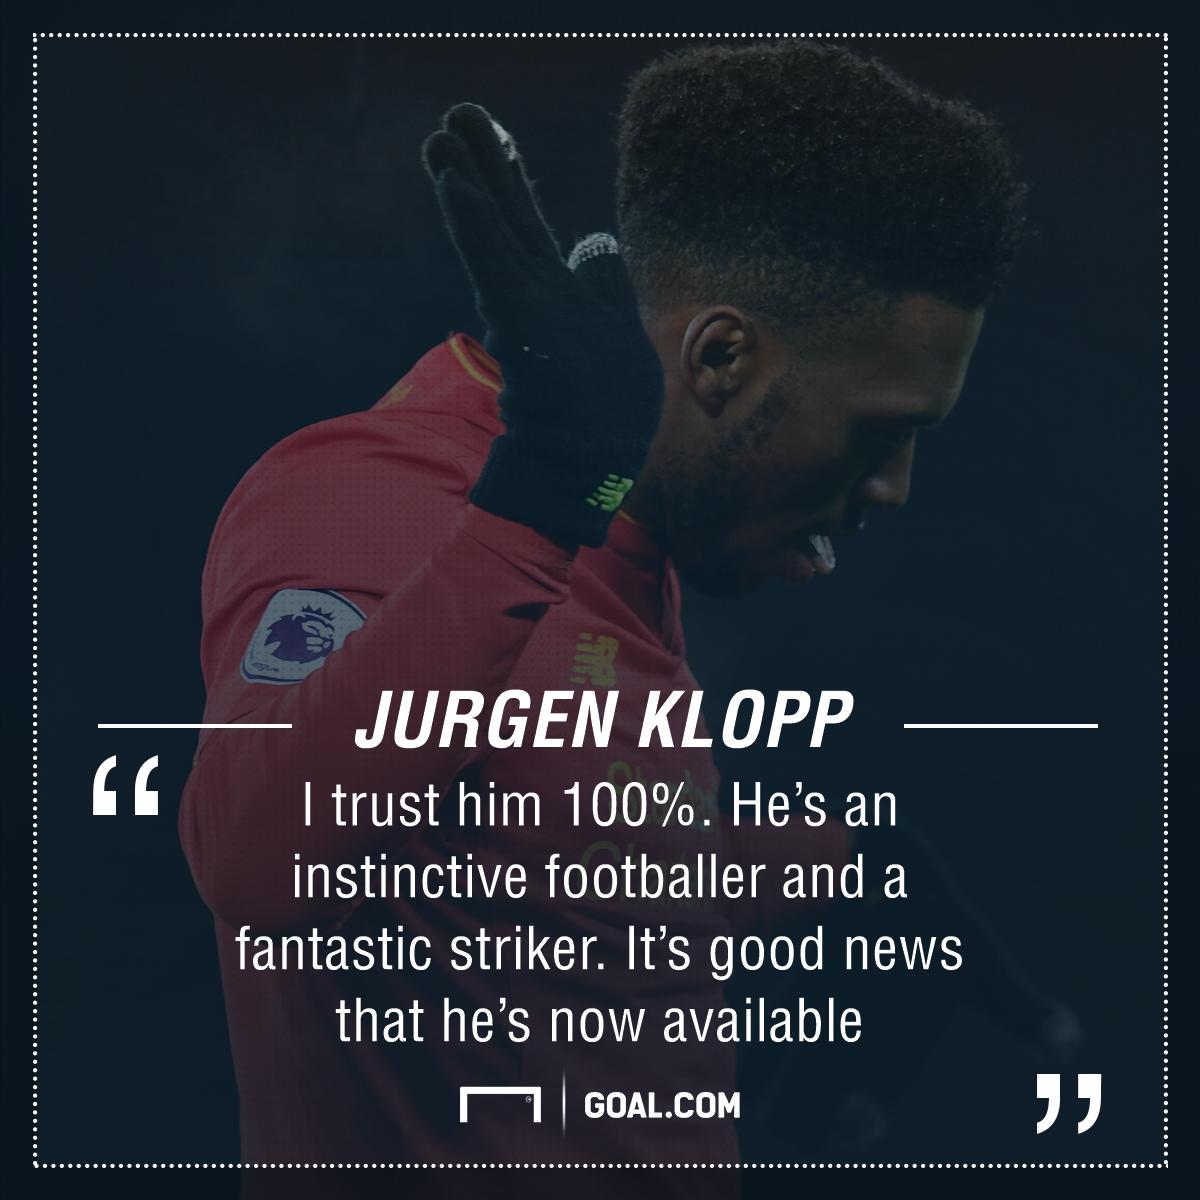 Daniel Sturridge ready for Liverpool starting spot, says Jurgen Klopp